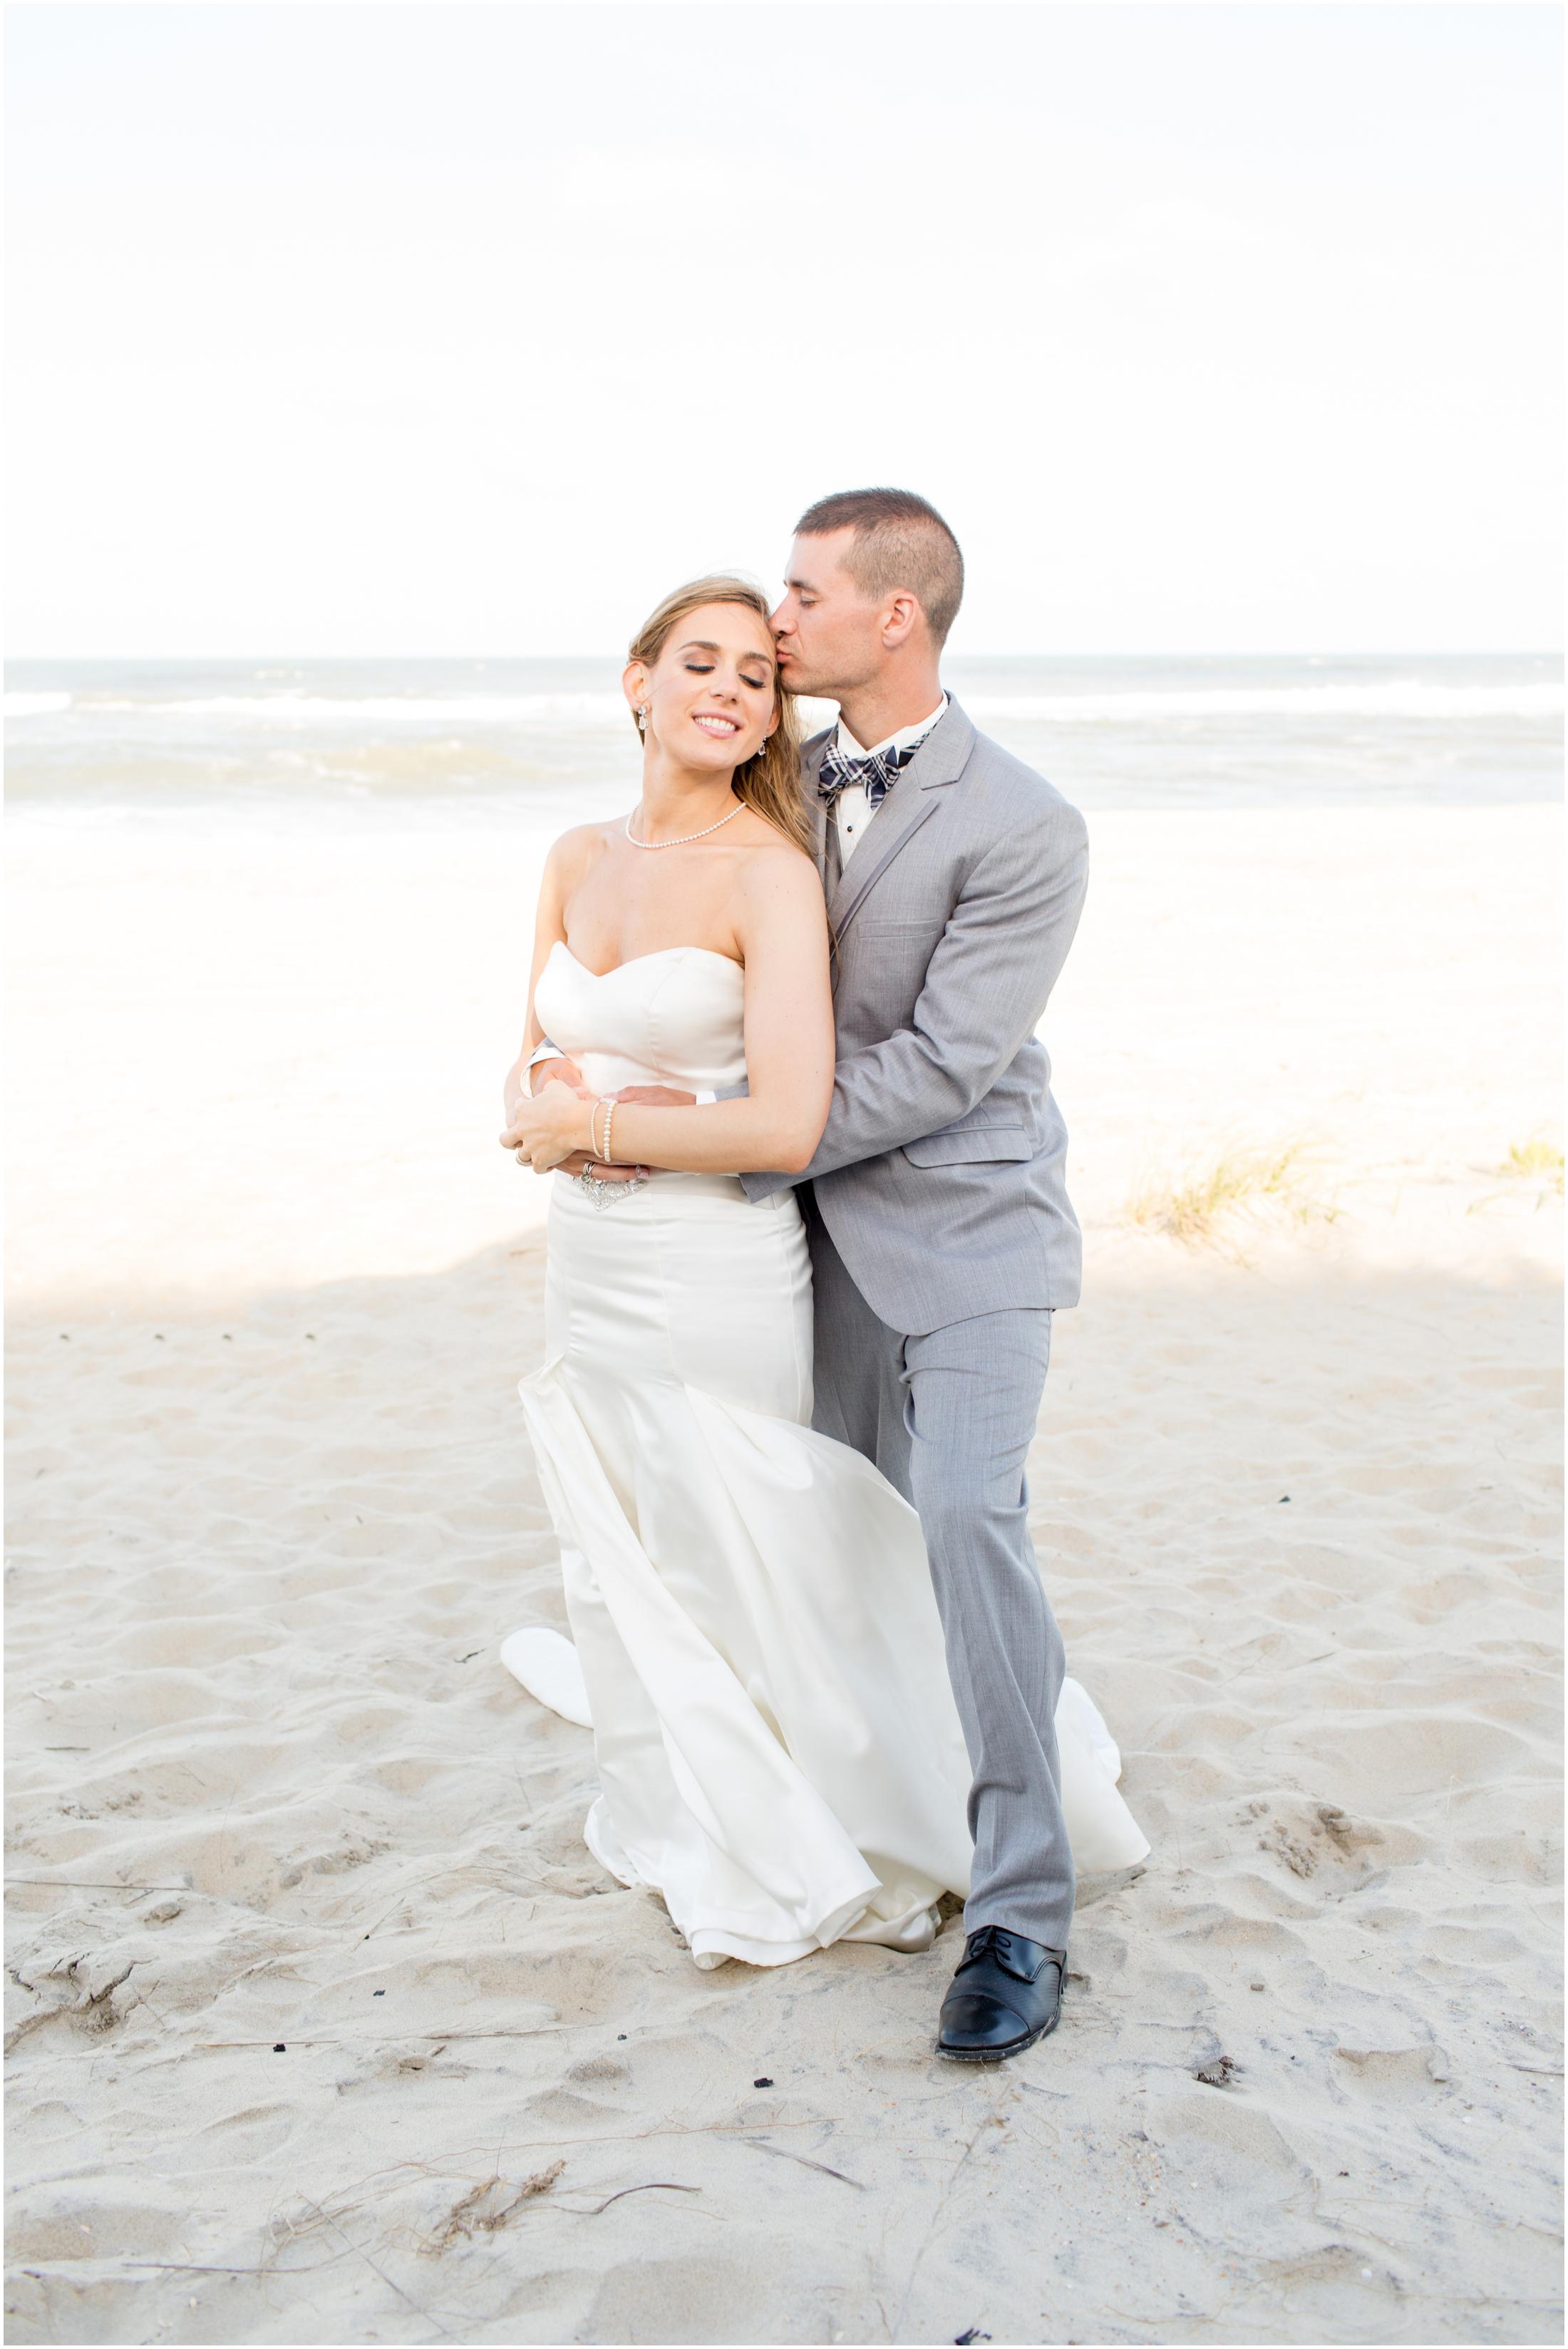 Pearce-Wedding-Bride-and-Groom-Portraits-692.jpg